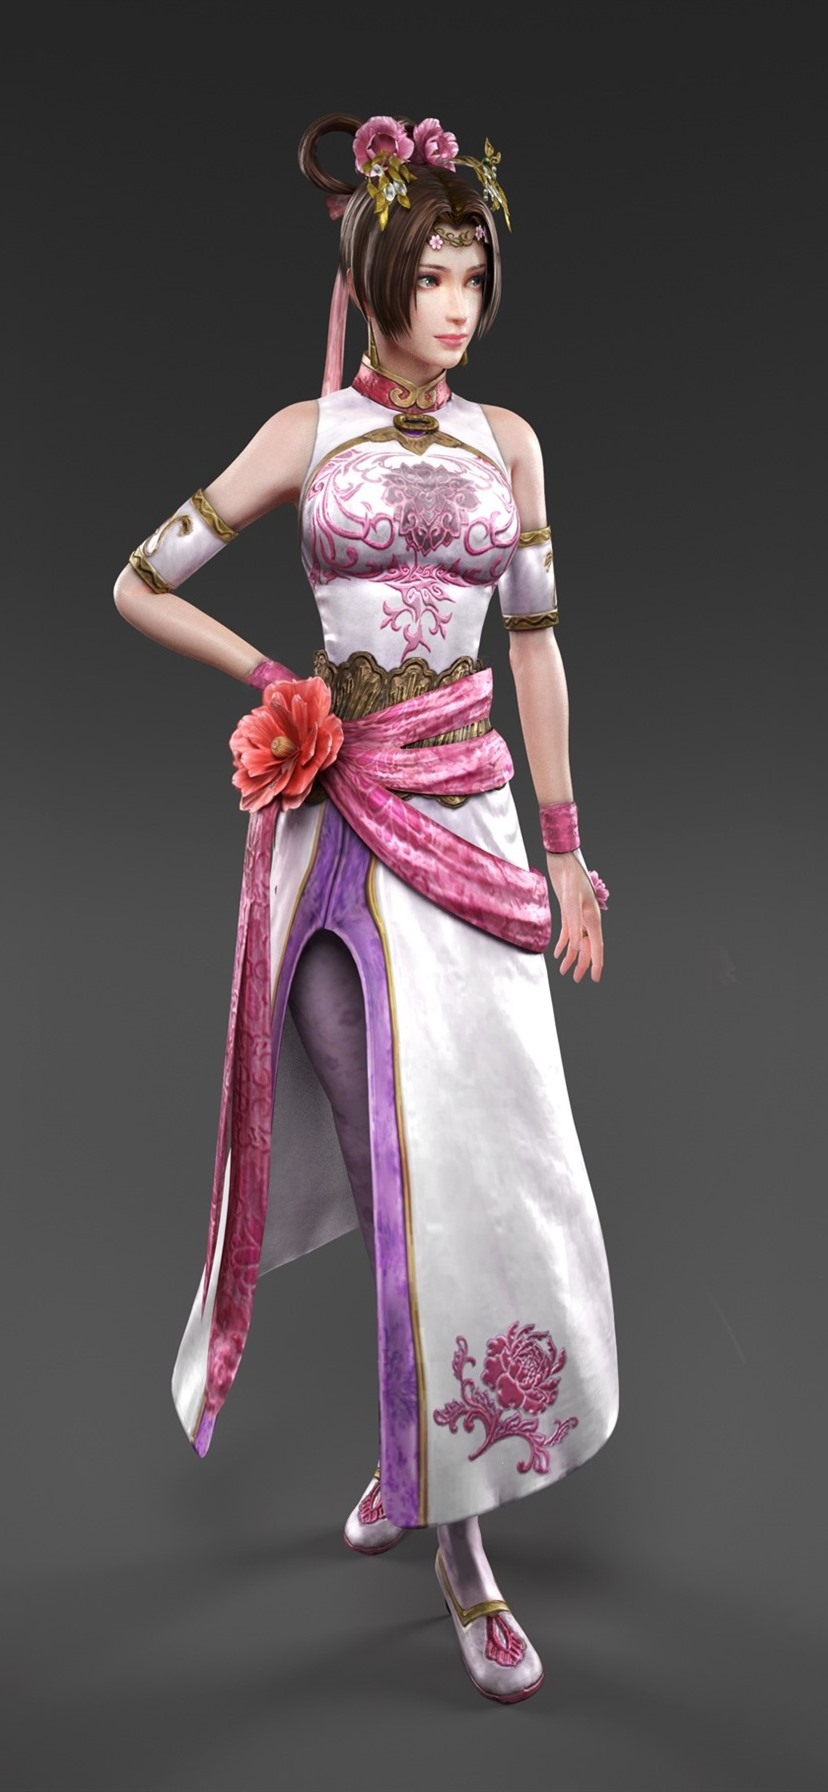 3D Asian Girl beautiful 3d girls, asian, three side views 828x1792 iphone